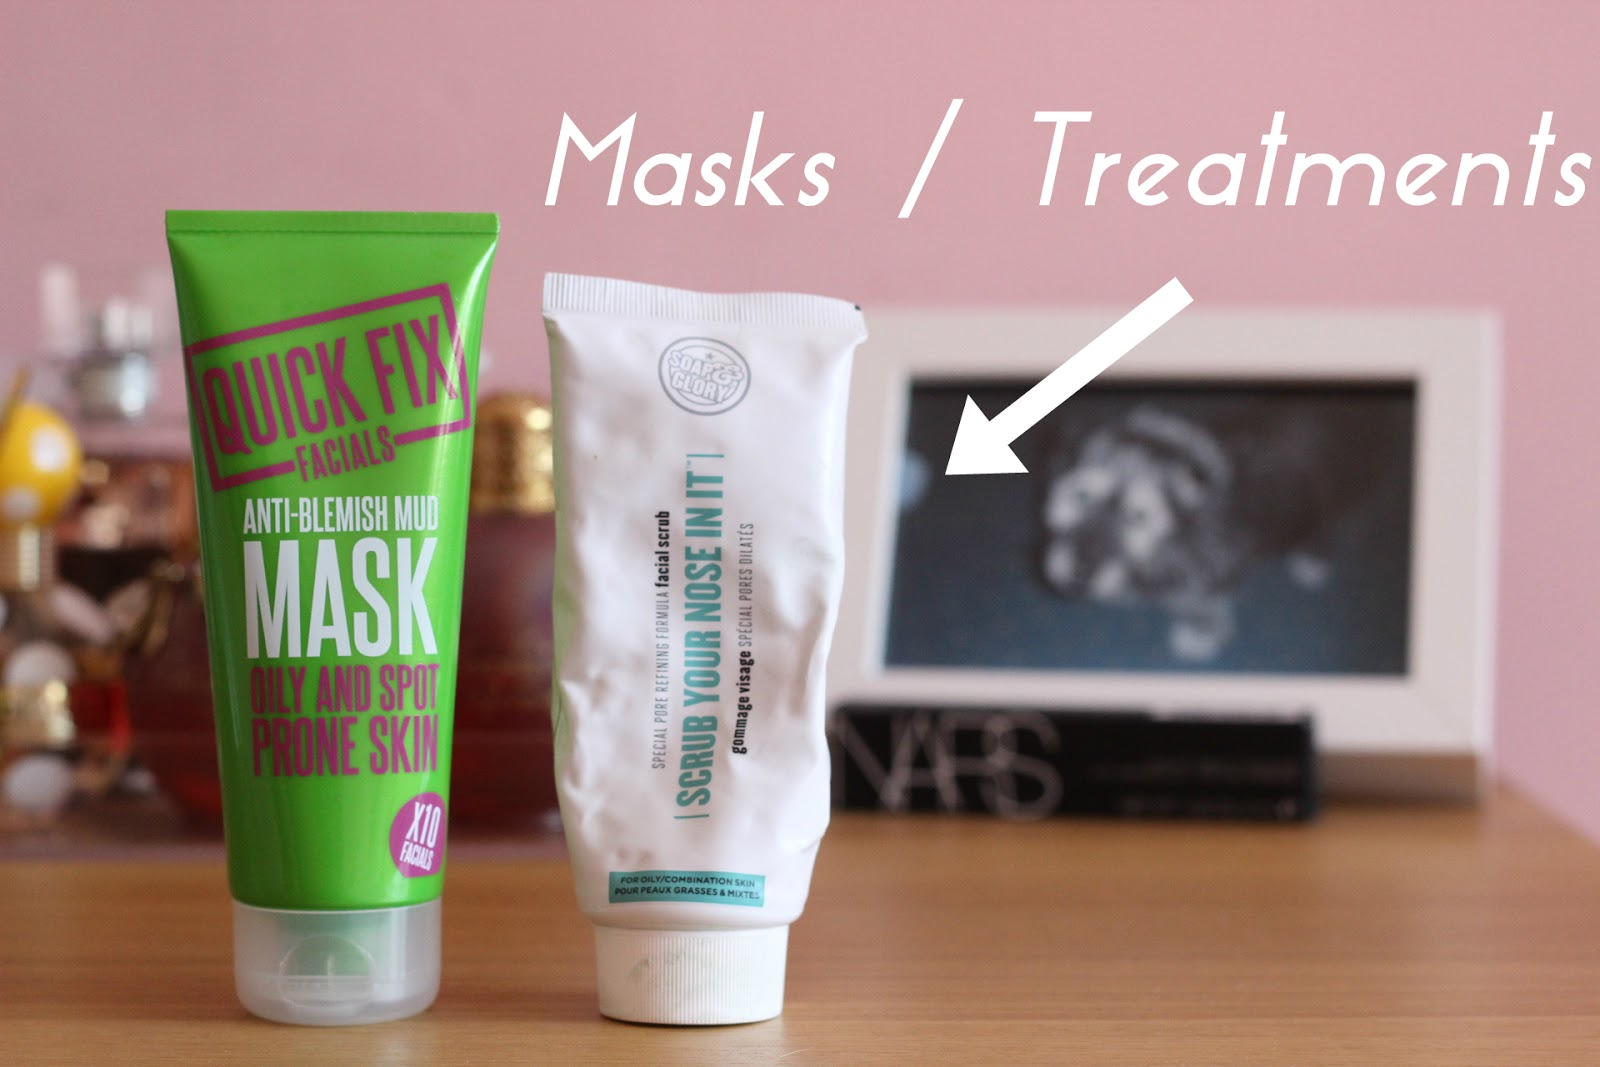 budget skincare, mask, scrubs